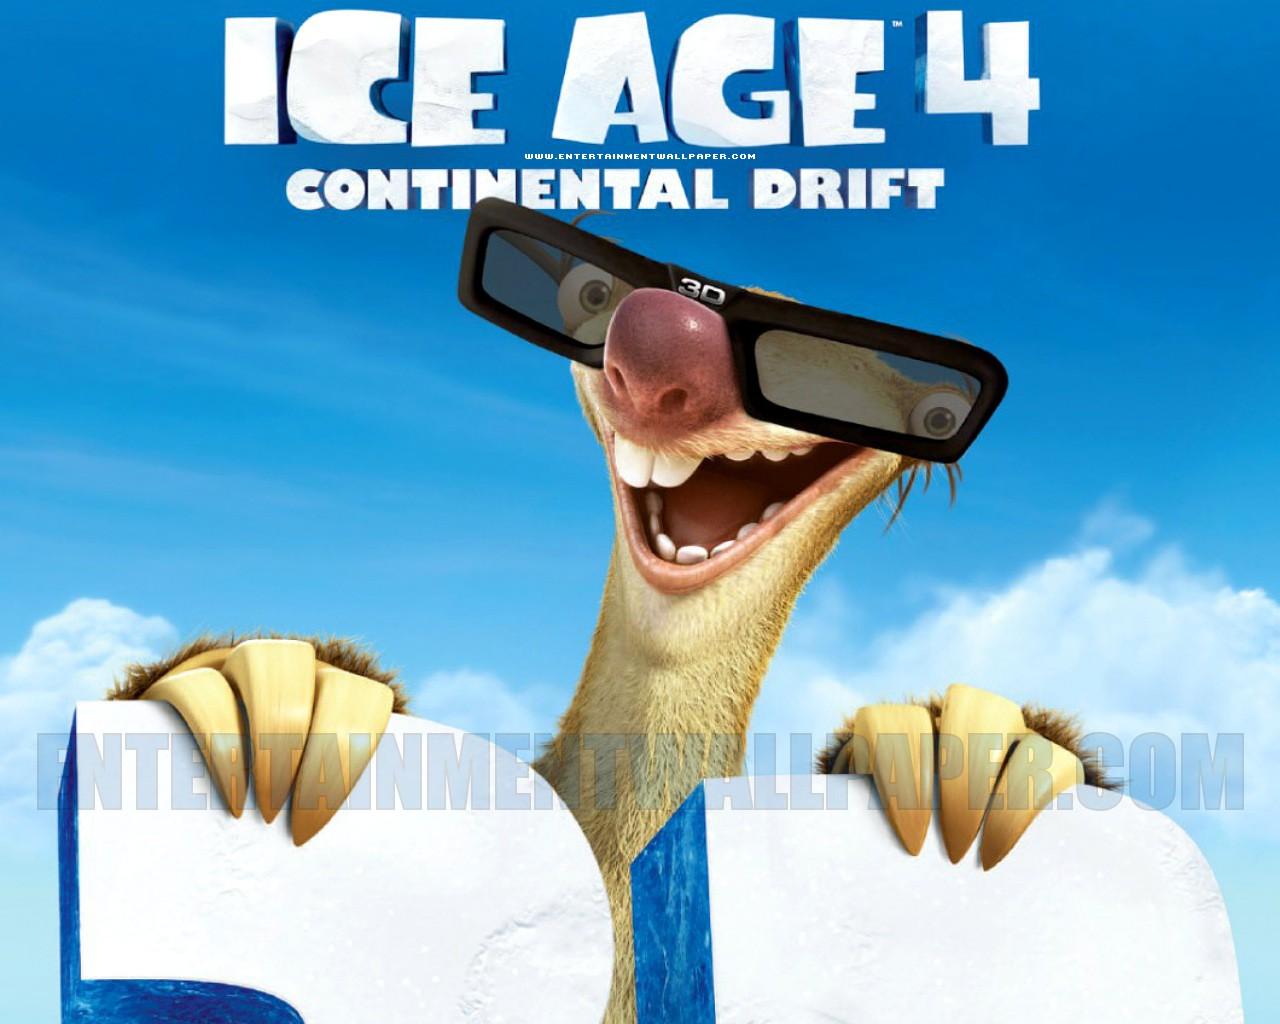 http://1.bp.blogspot.com/-c3V4c9jir2E/UAKcsXxlC-I/AAAAAAAAEU0/yalWlsoi37c/s1600/Ice-Age-Continental-Drift-ice-age-4-.jpg